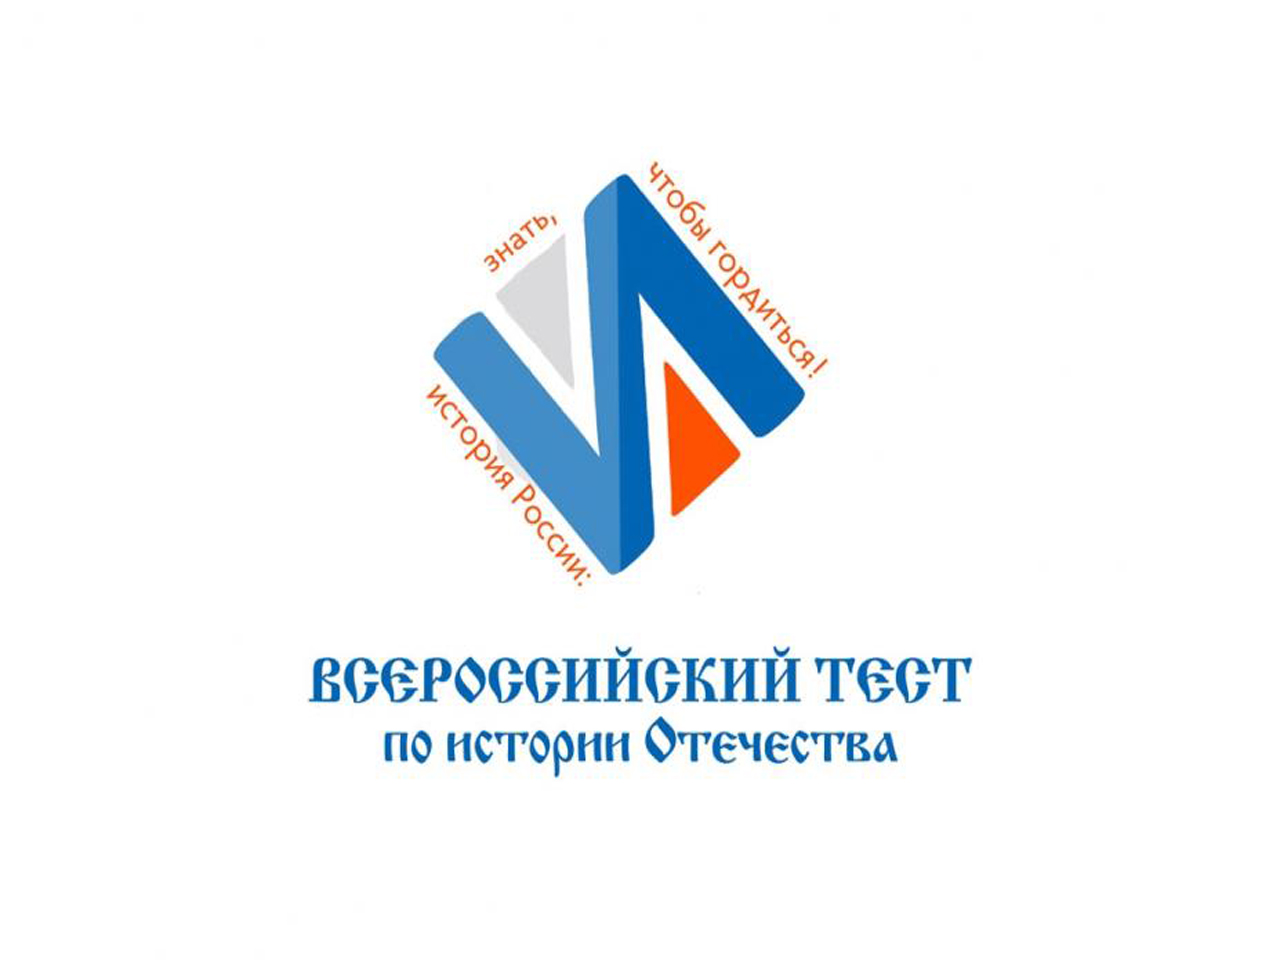 Жители Тверской области приняли участие в акции «Тест по истории Отечества»